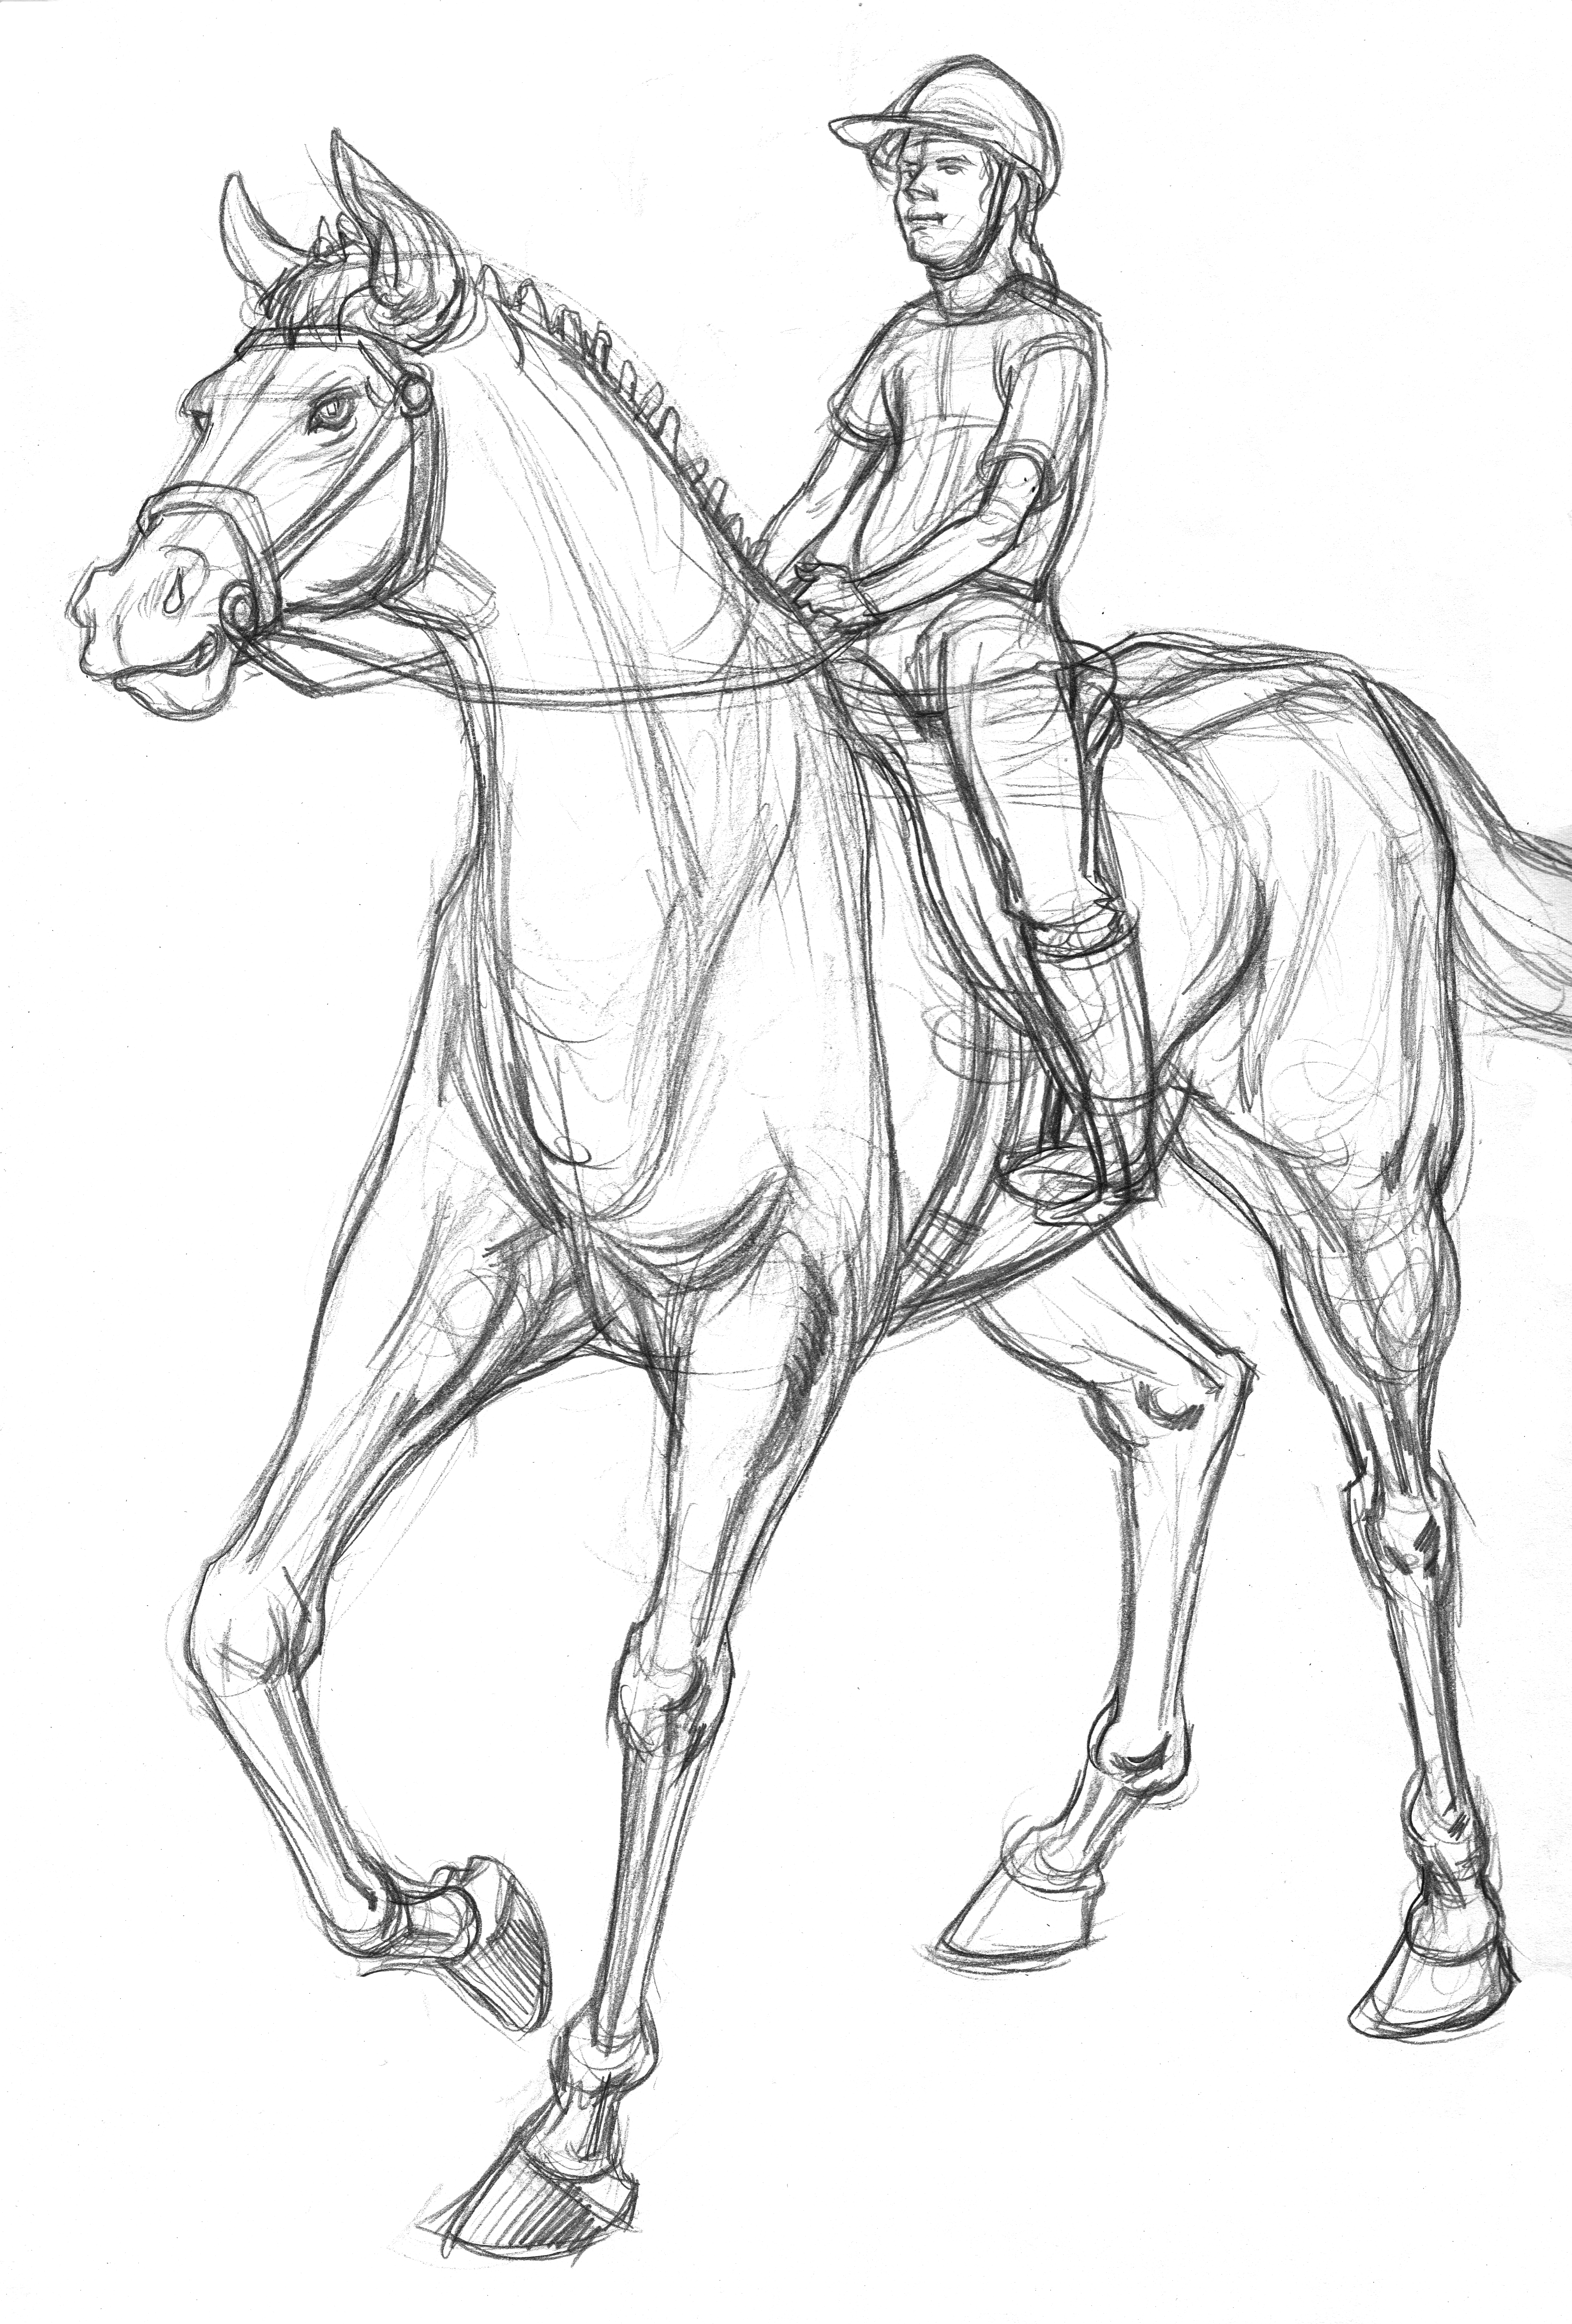 Horse Tall & Rider